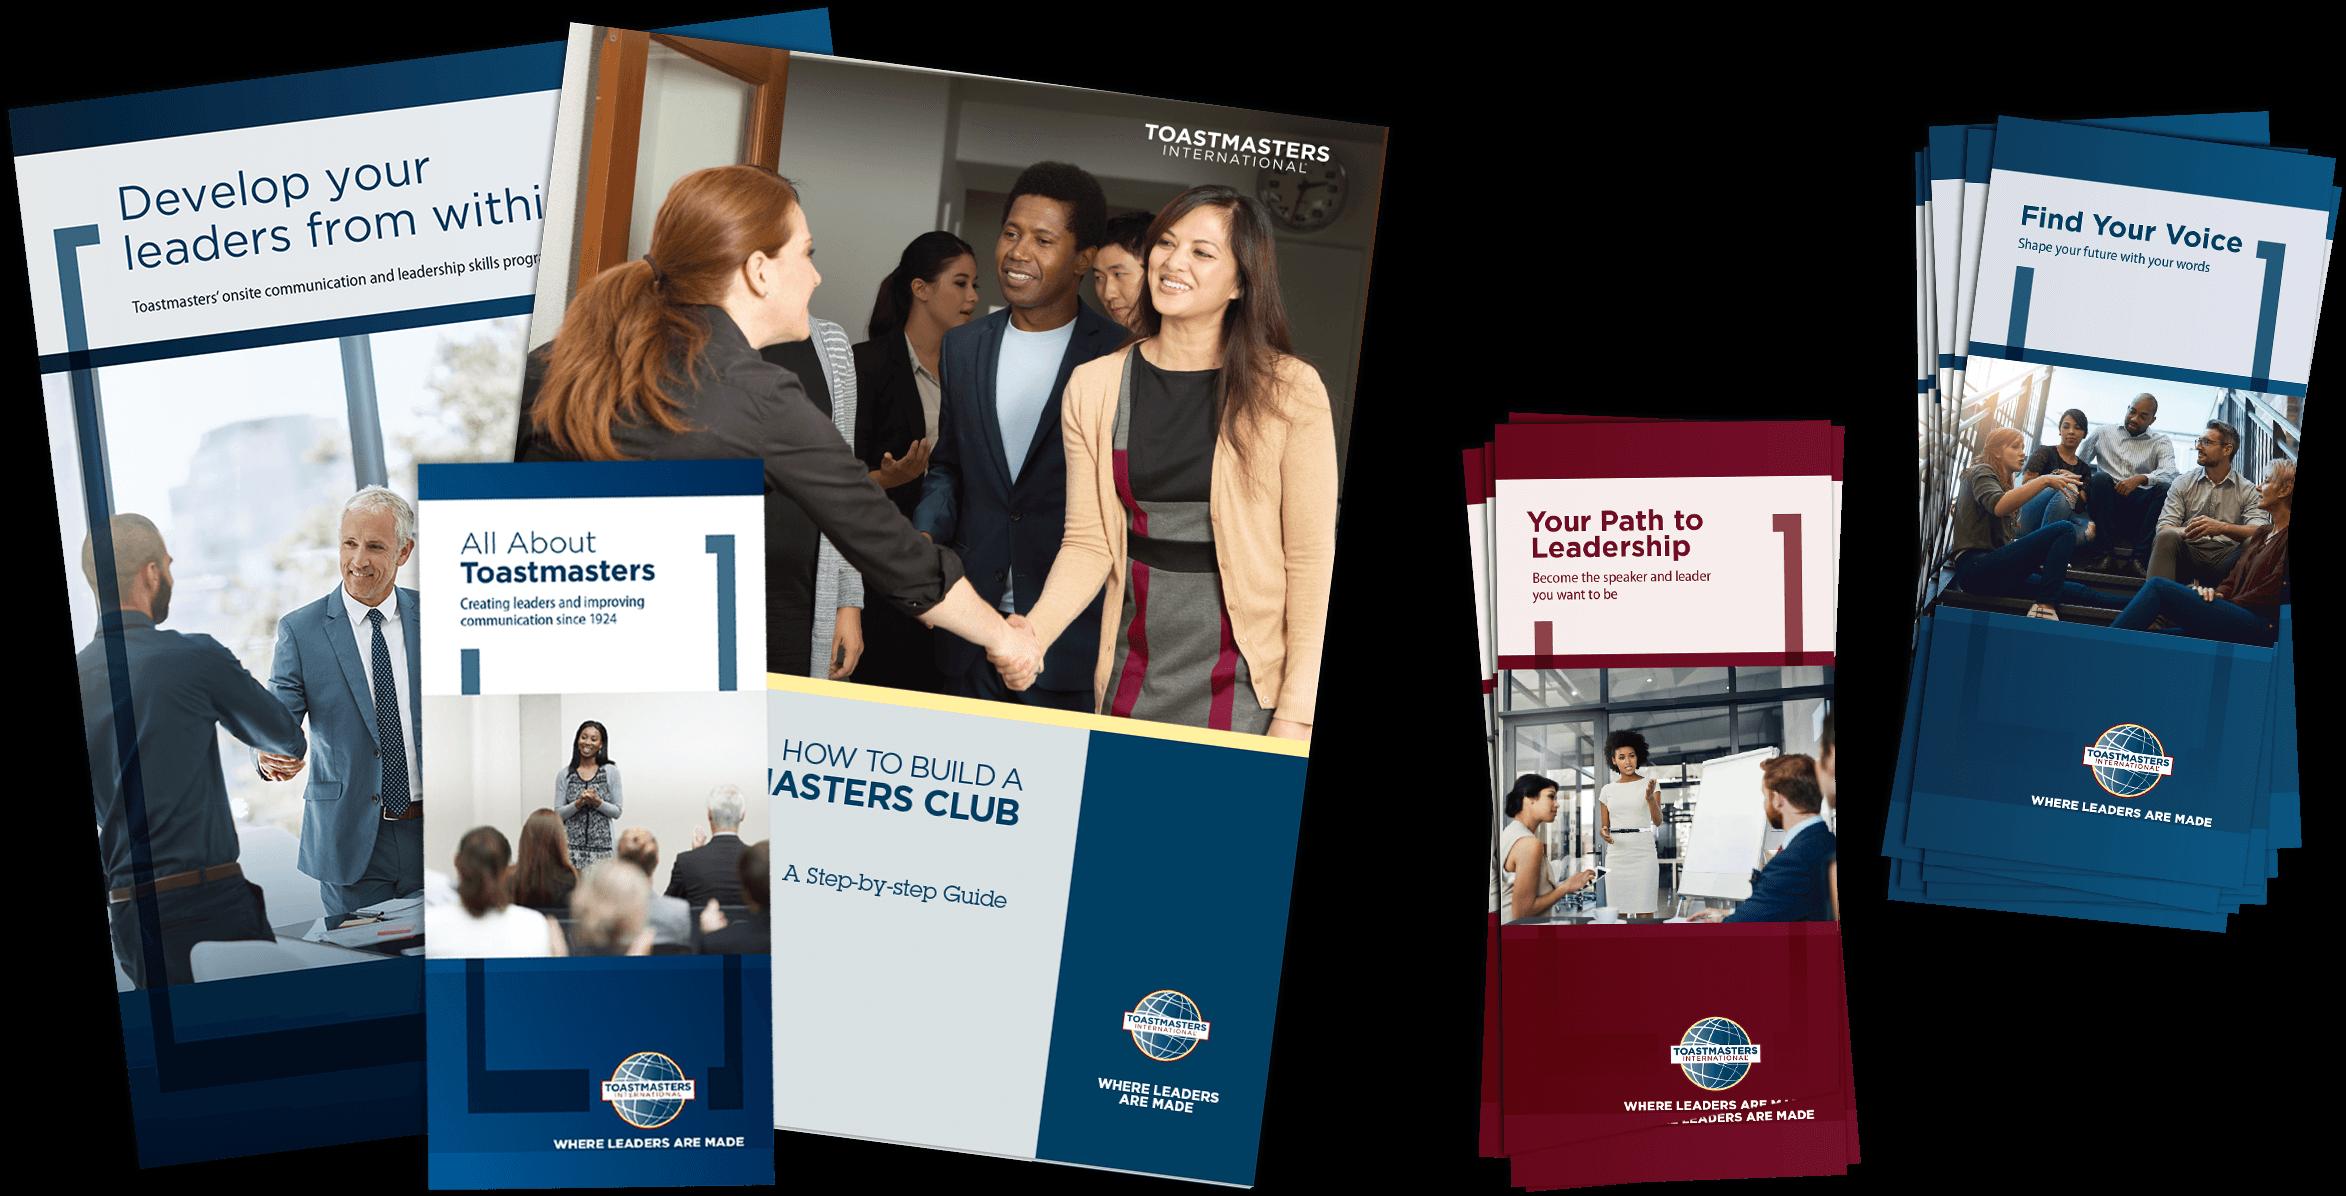 New Club Information Kit